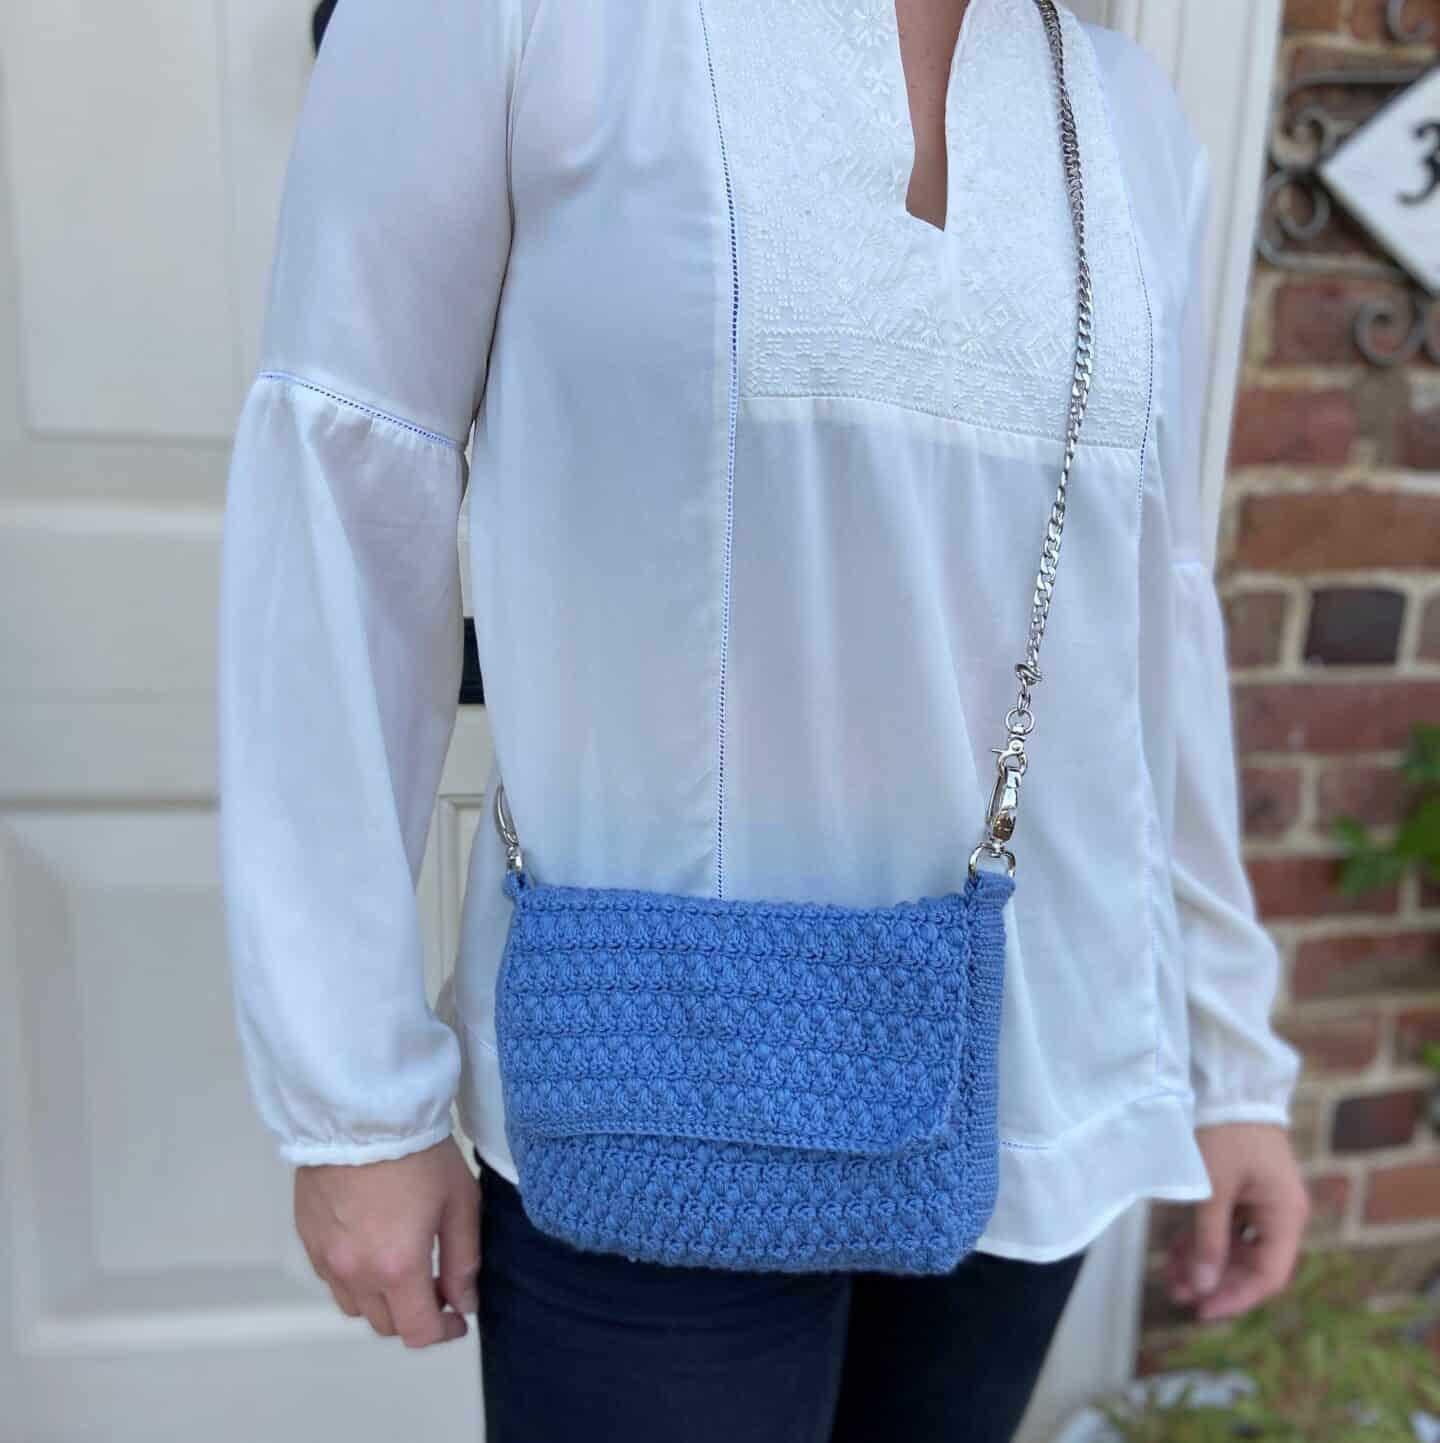 denim crochet clutch bag on woman in white shirt